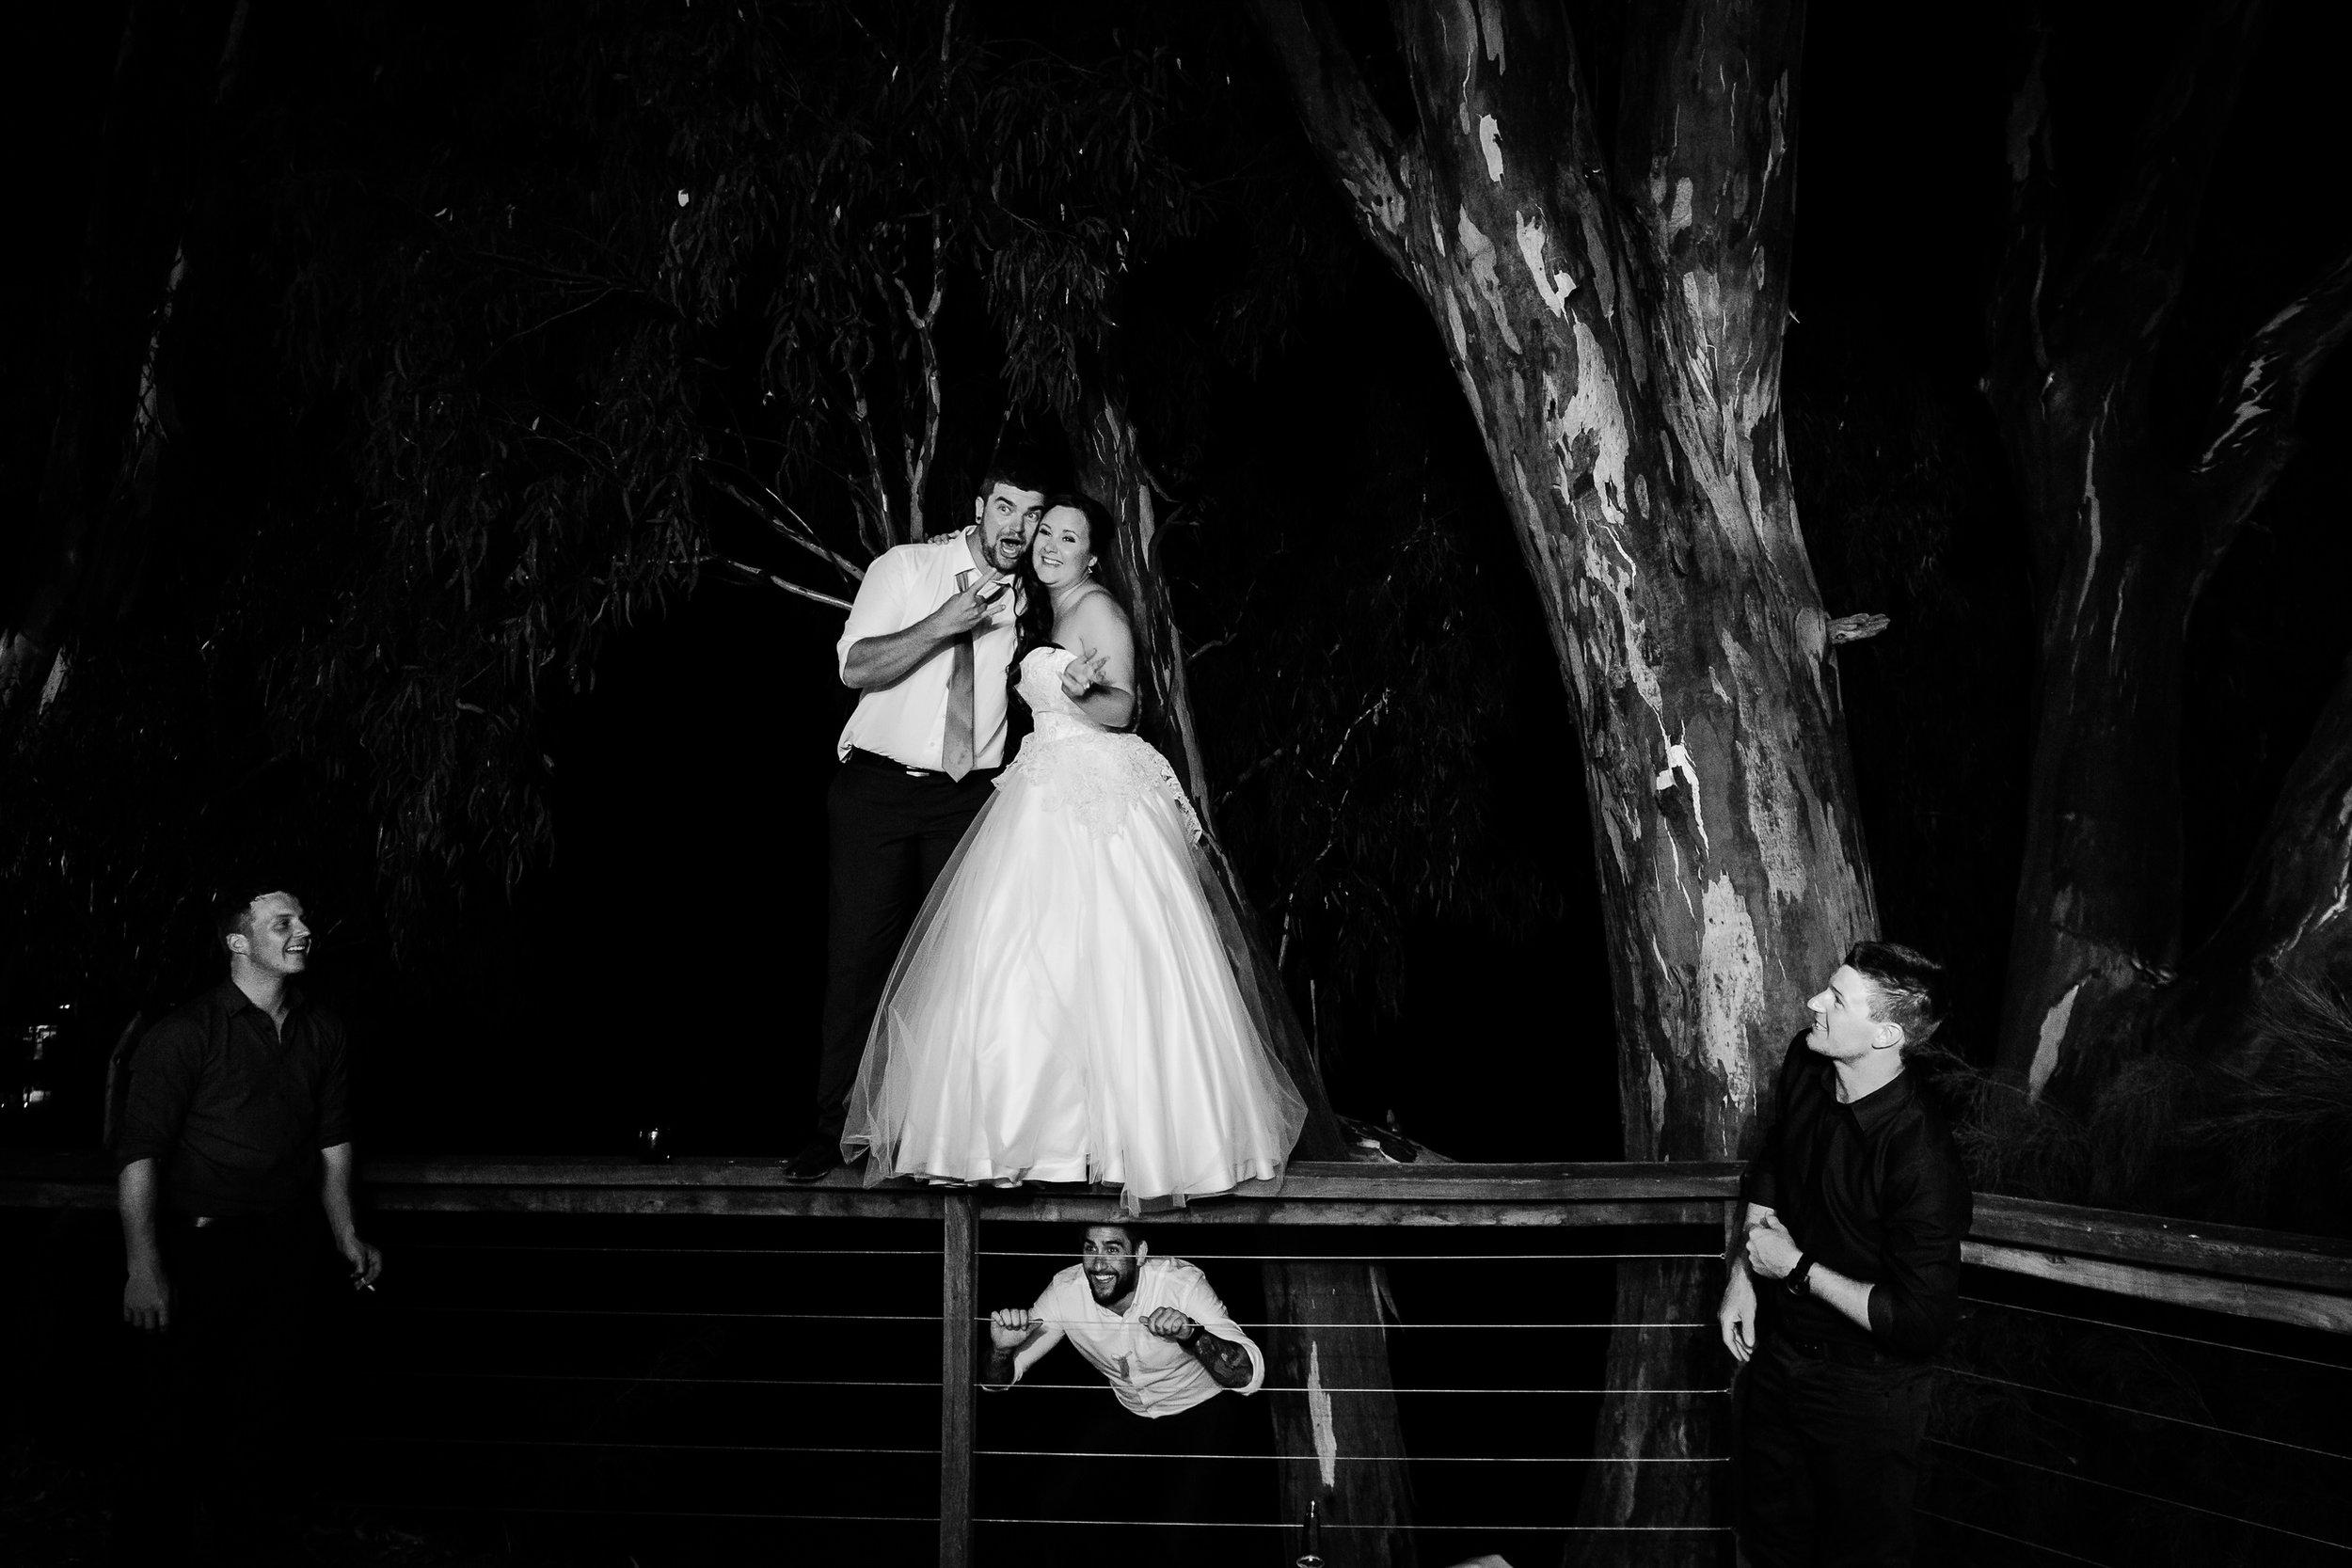 Justin_Jim_Echuca_Wedding_Photography_Tindarra-360.JPG